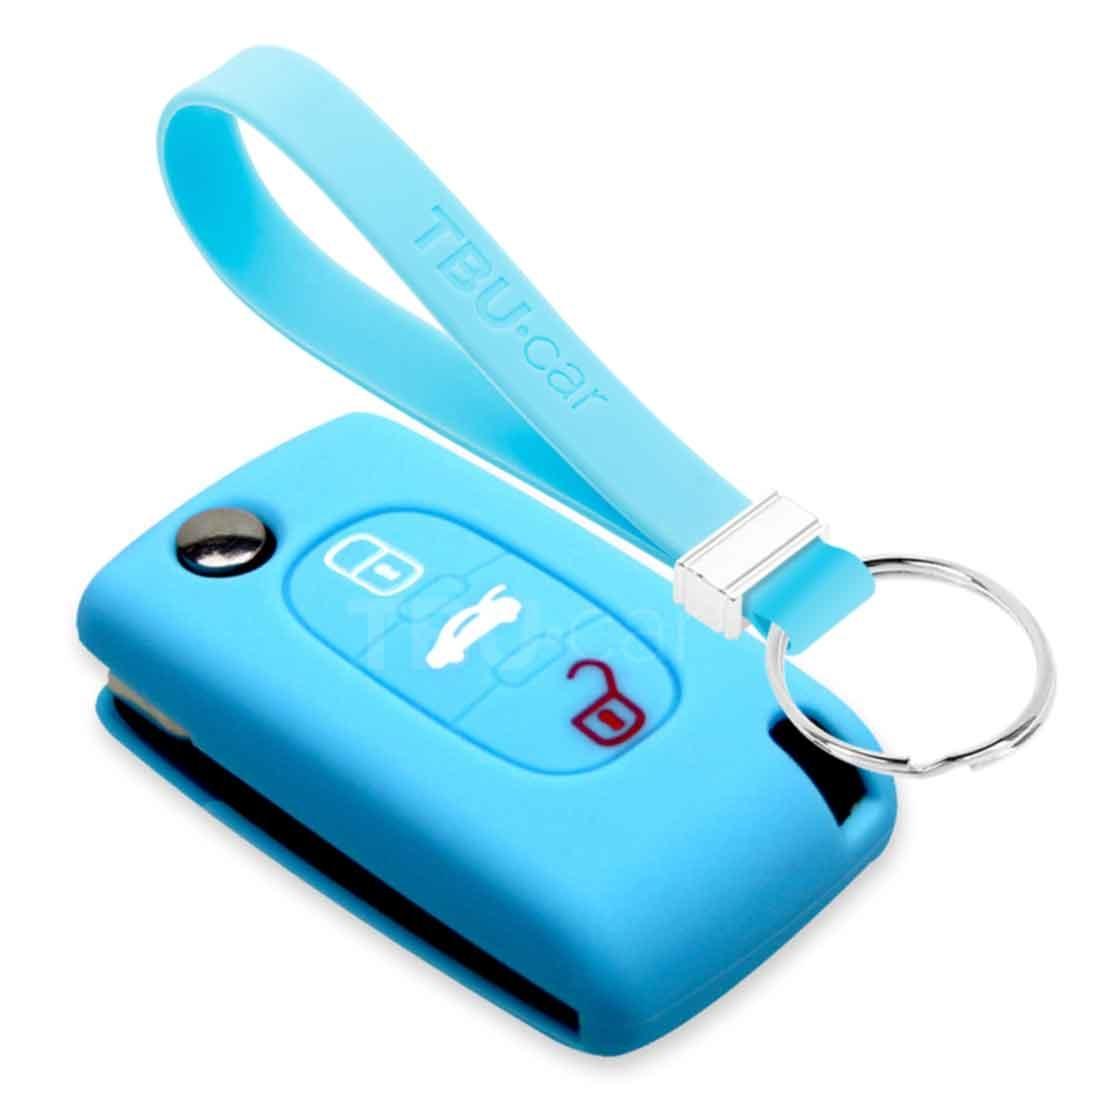 TBU car TBU car Funda Carcasa llave compatible con Fiat - Funda de Silicona - Cover de Llave Coche - Azul claro